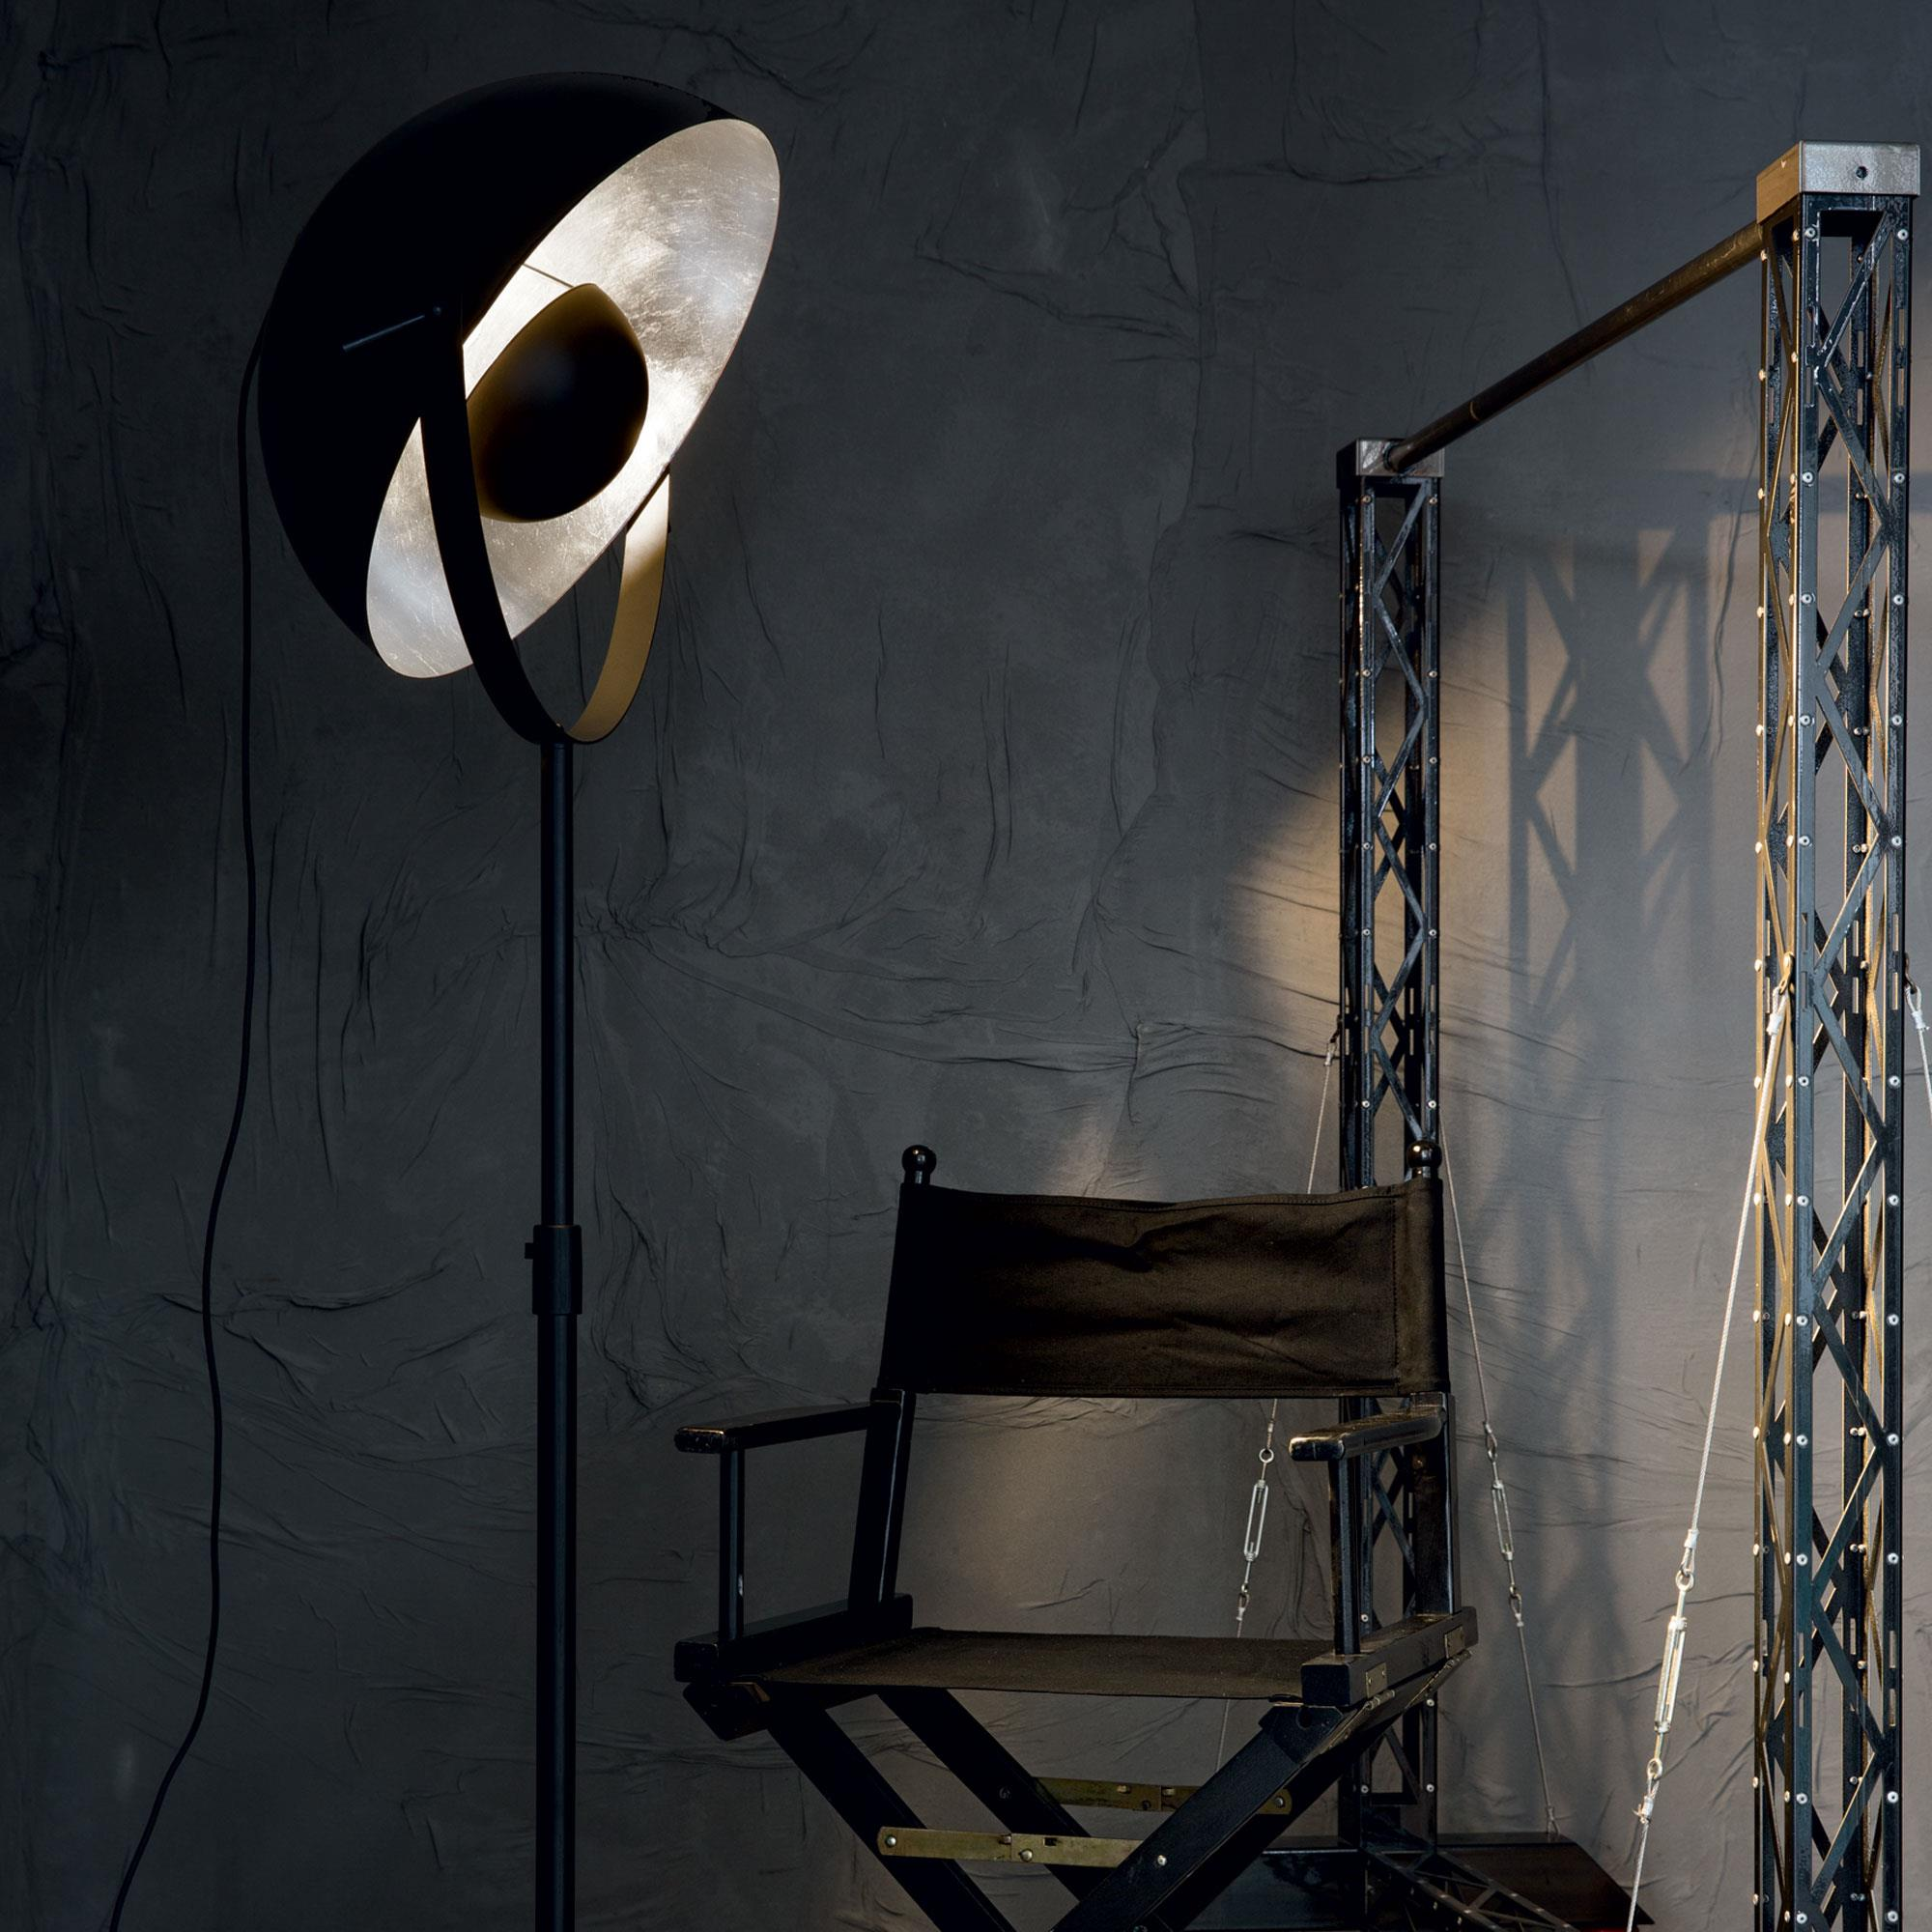 Ideal Lux 132785 Stage PT1 Foglia Argento állólámpa